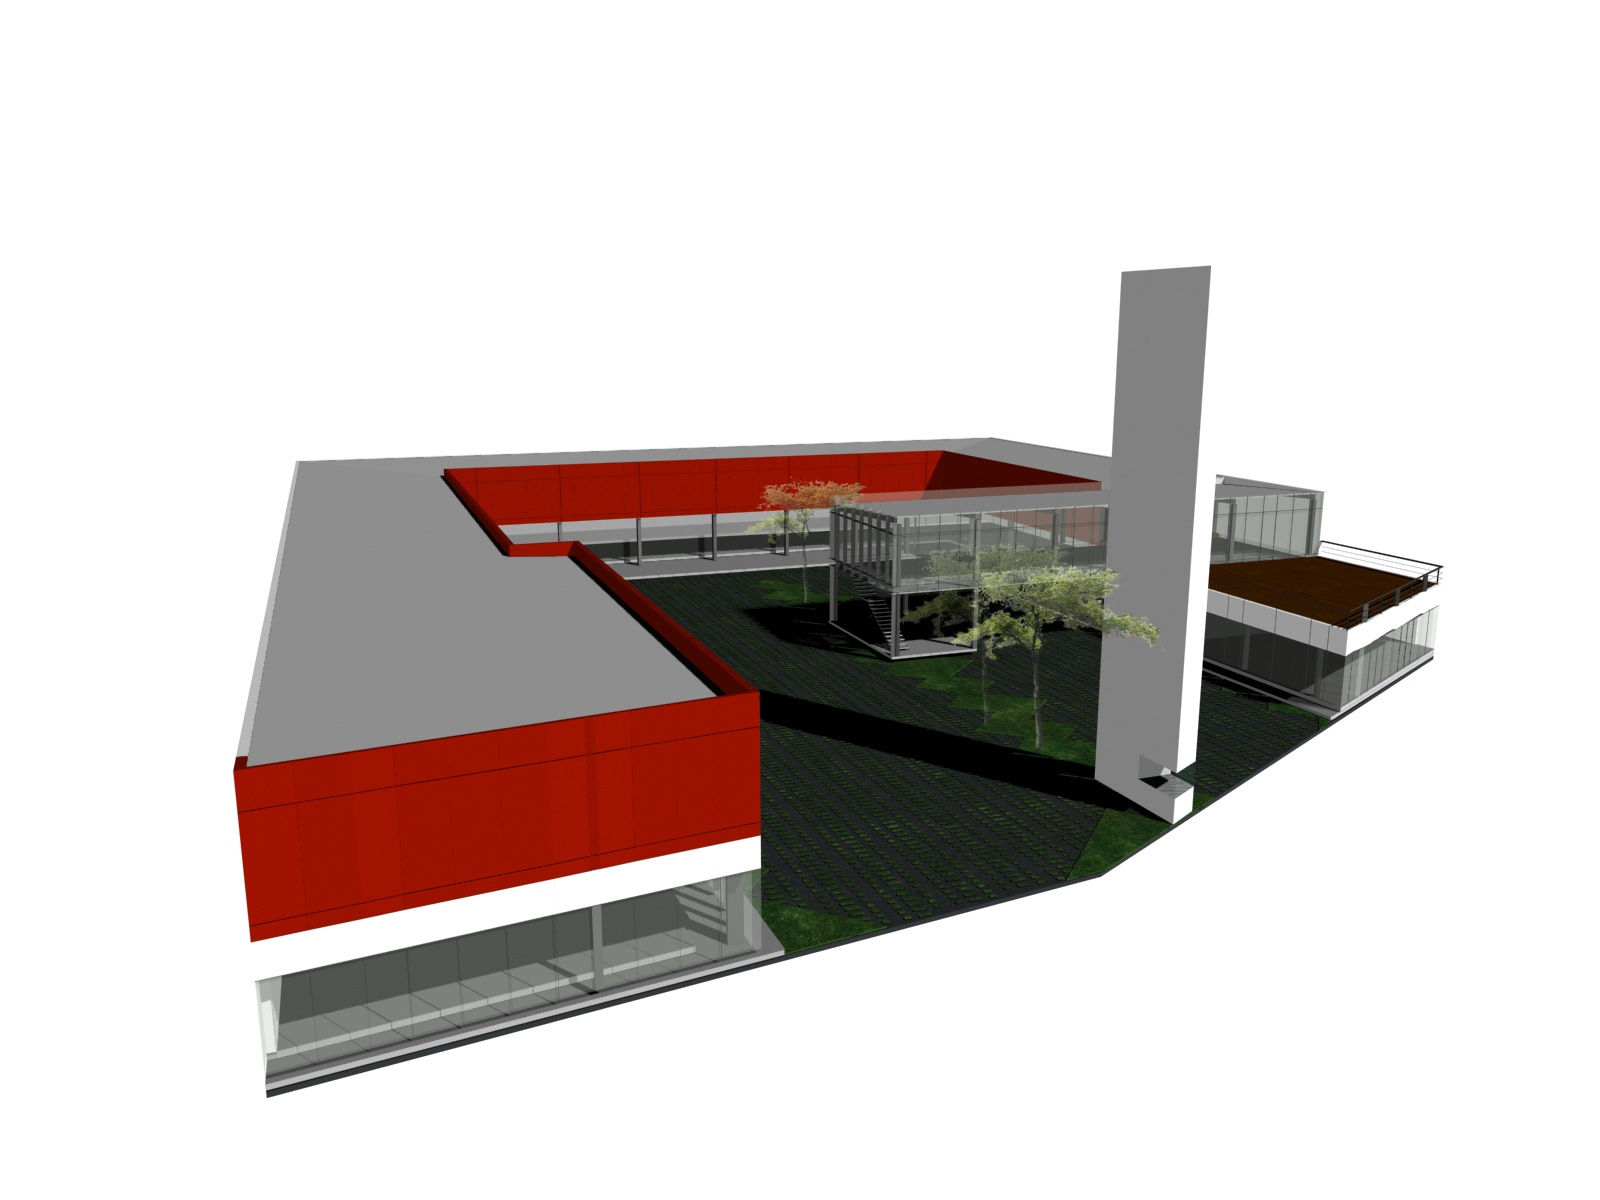 plaza lerma 1.JPG